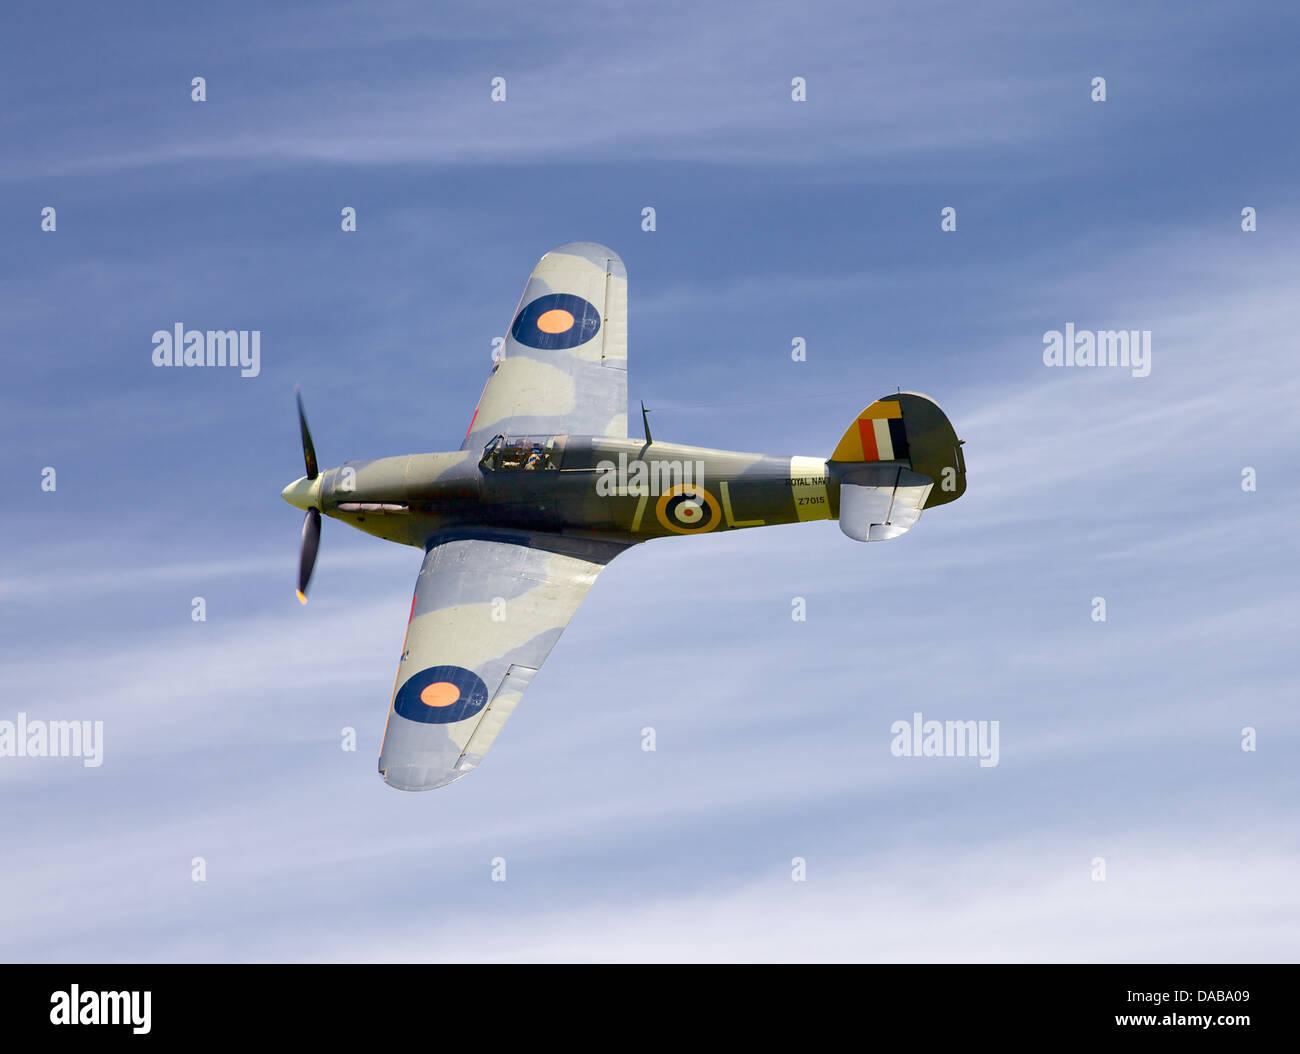 A 1941 Hawker sea Hurricane, England - Stock Image